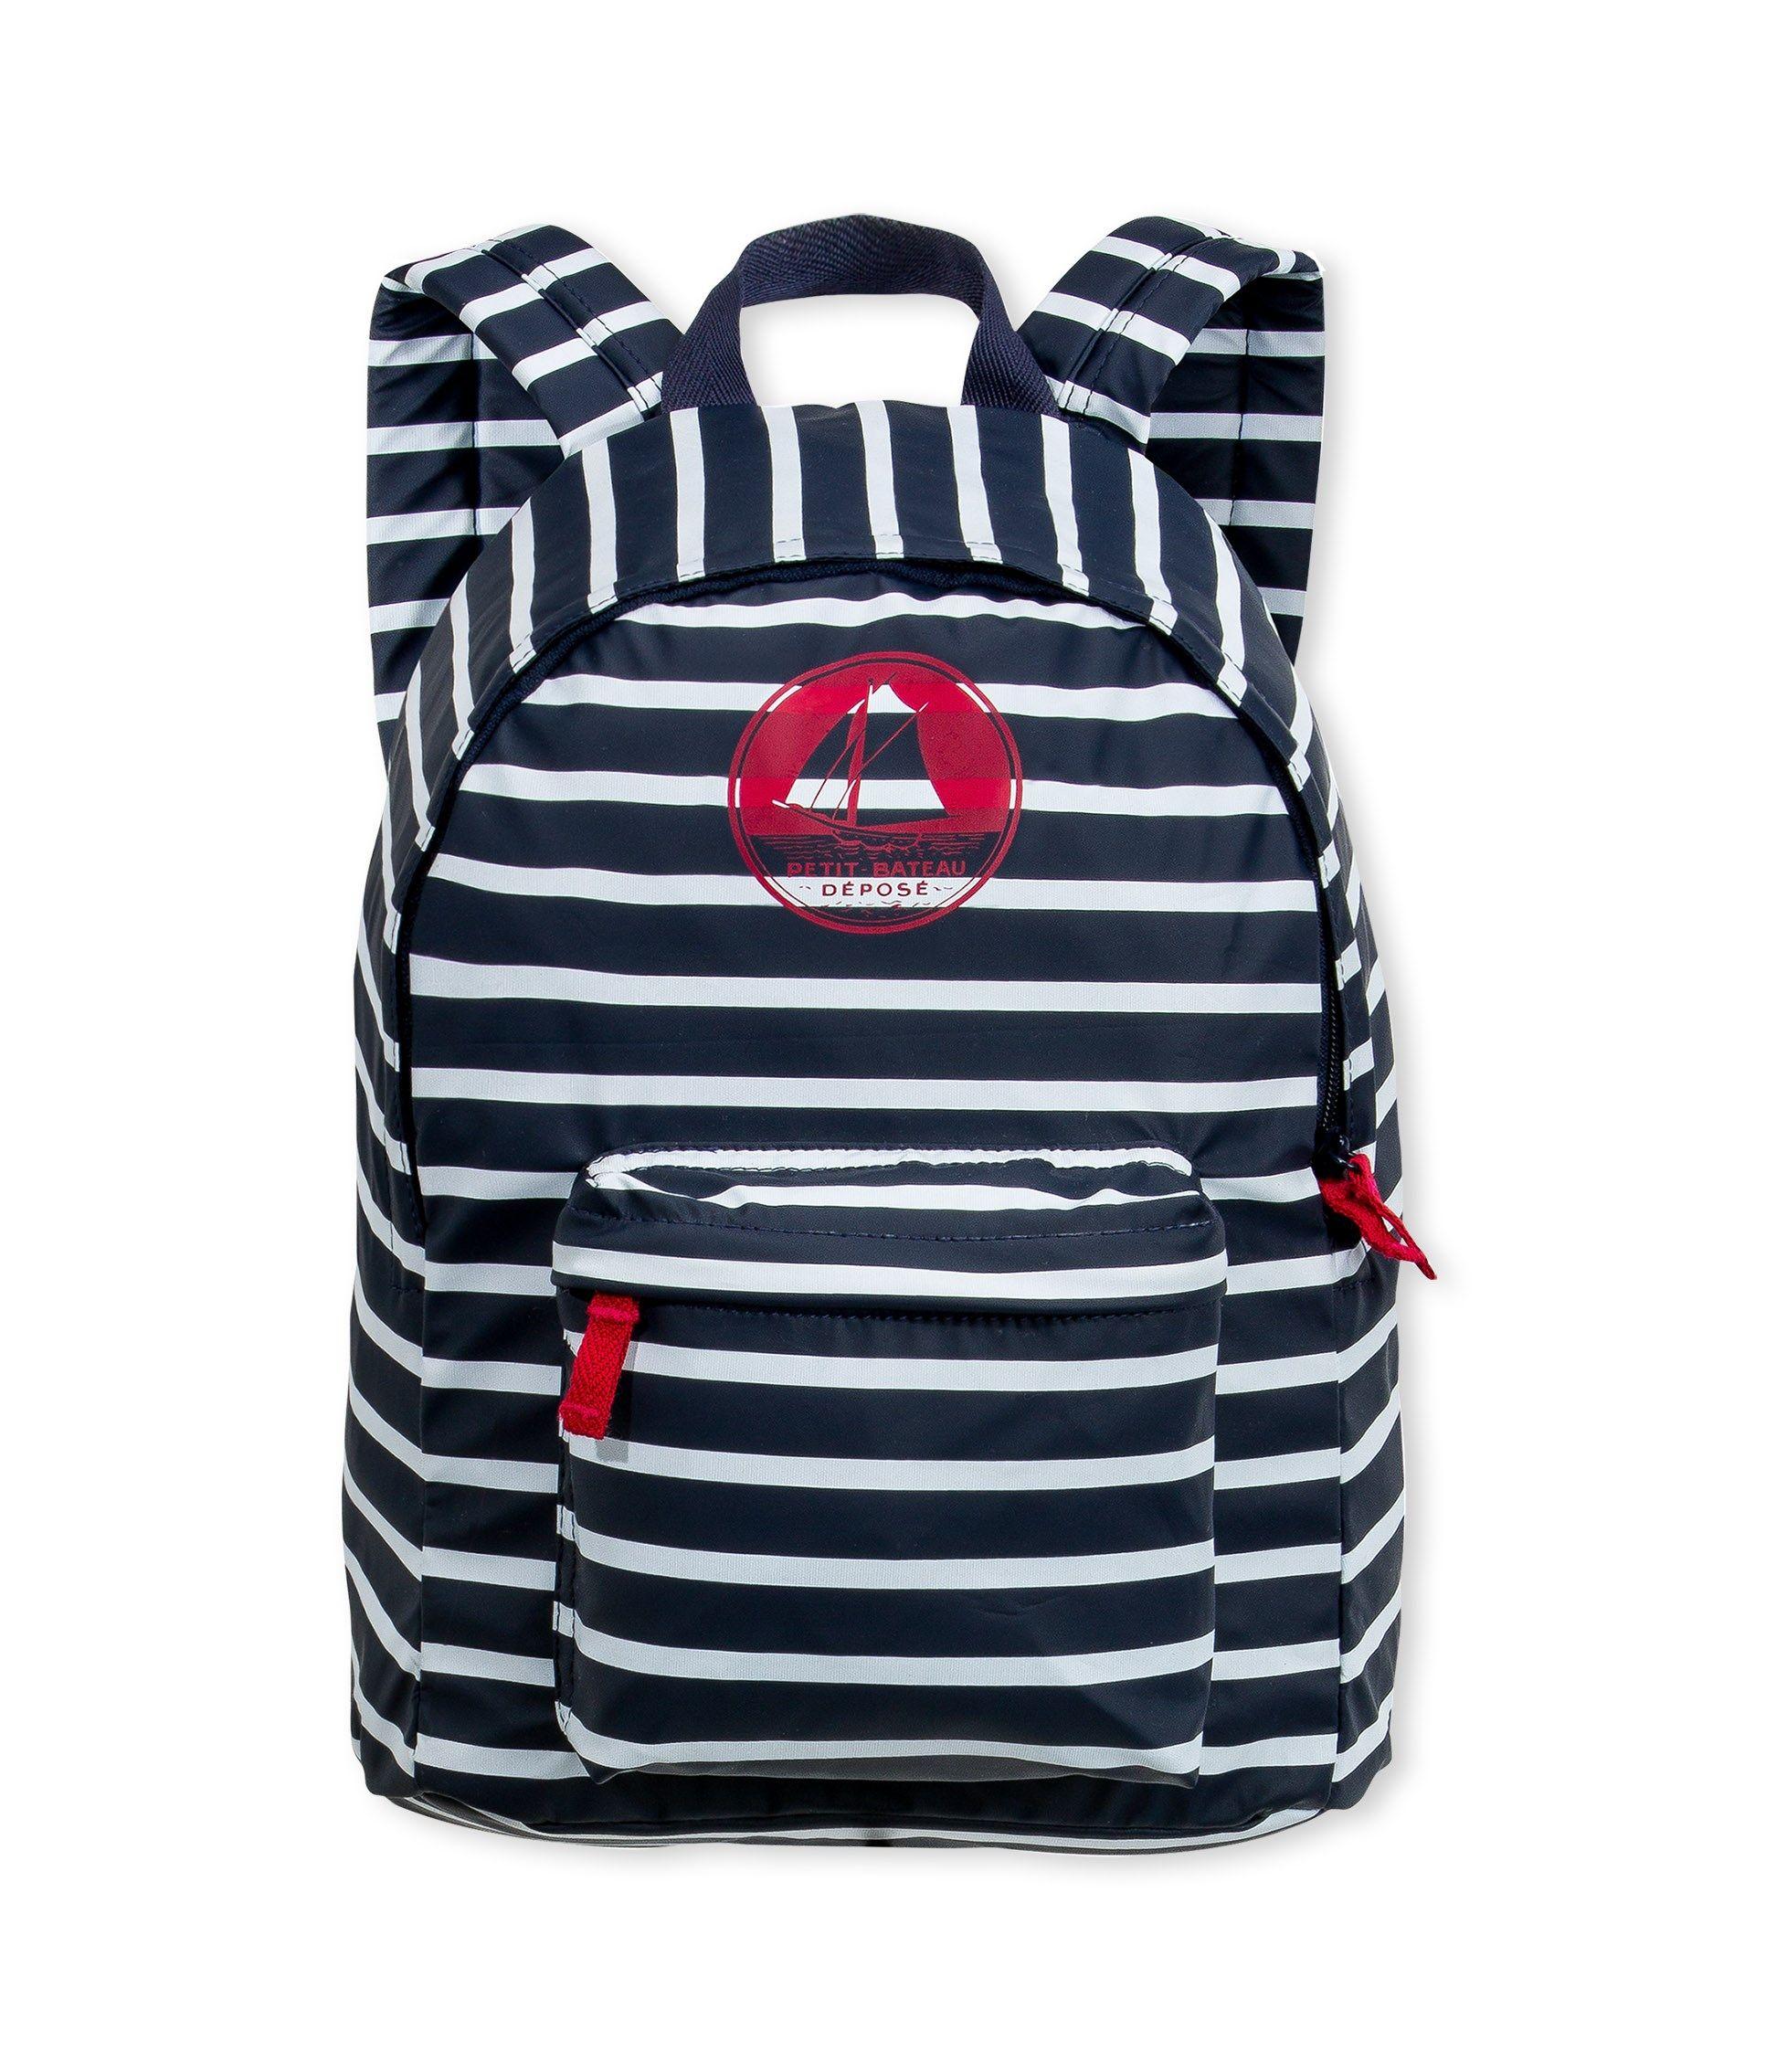 Sac de marin garçon en jersey lourd vLo0R